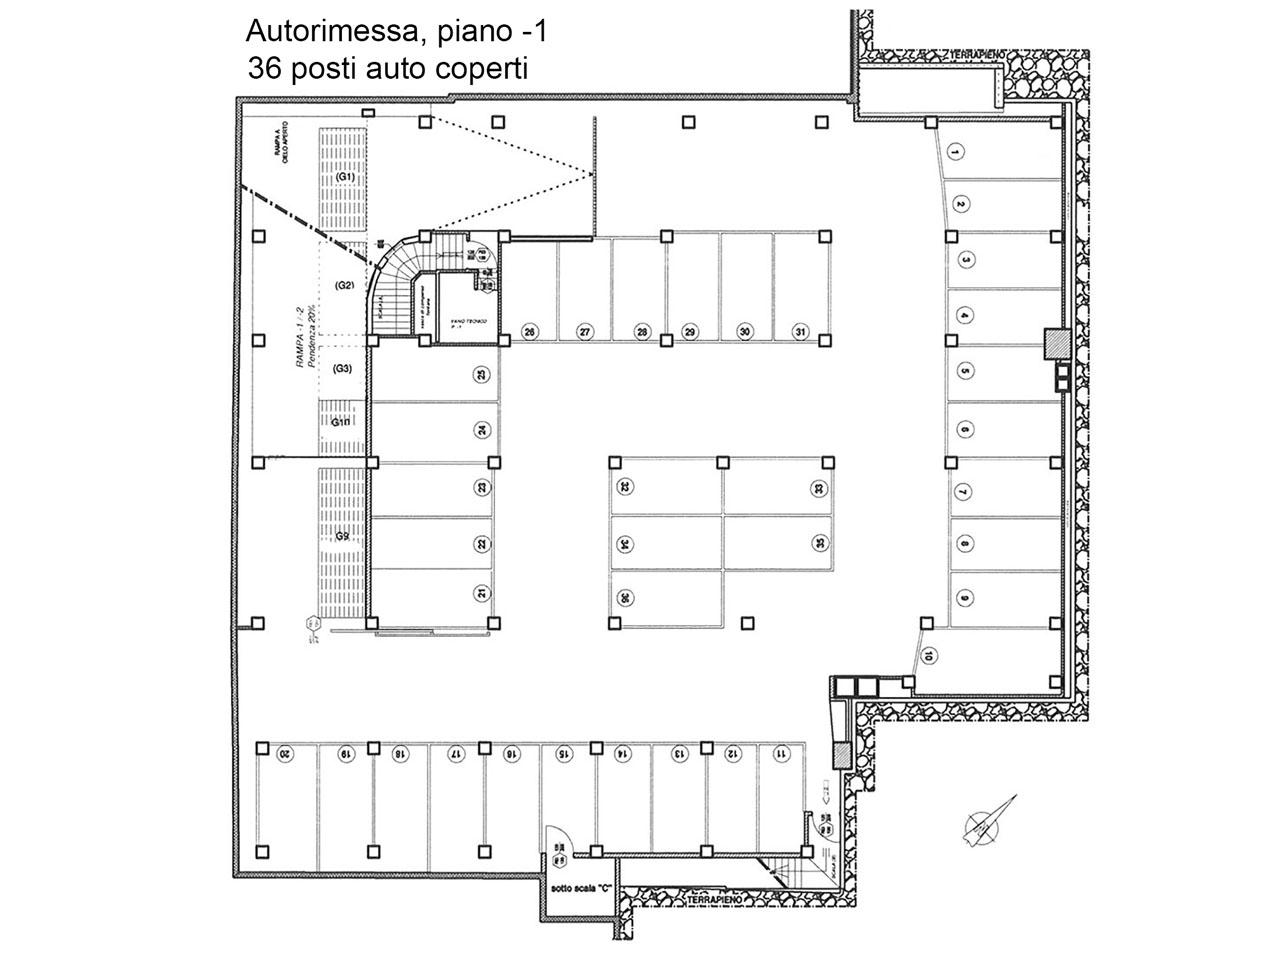 Floor plan of garage at first basement floor - Atlantic Business Center - Milan